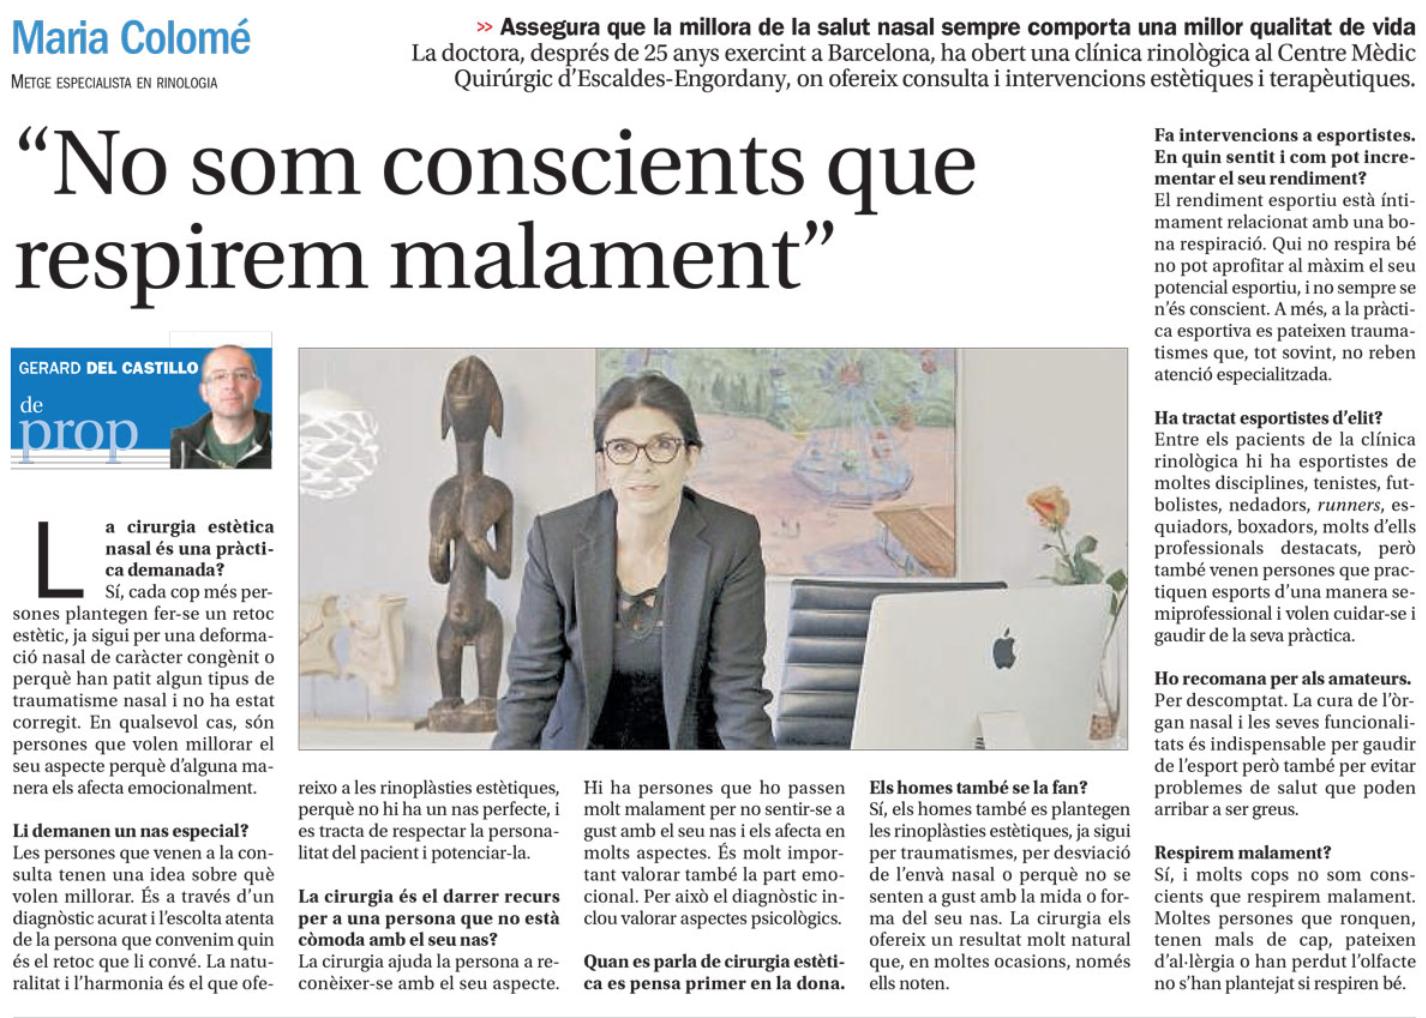 Clínica Rinològica Maria Colomé - Notícies 4 Andorra